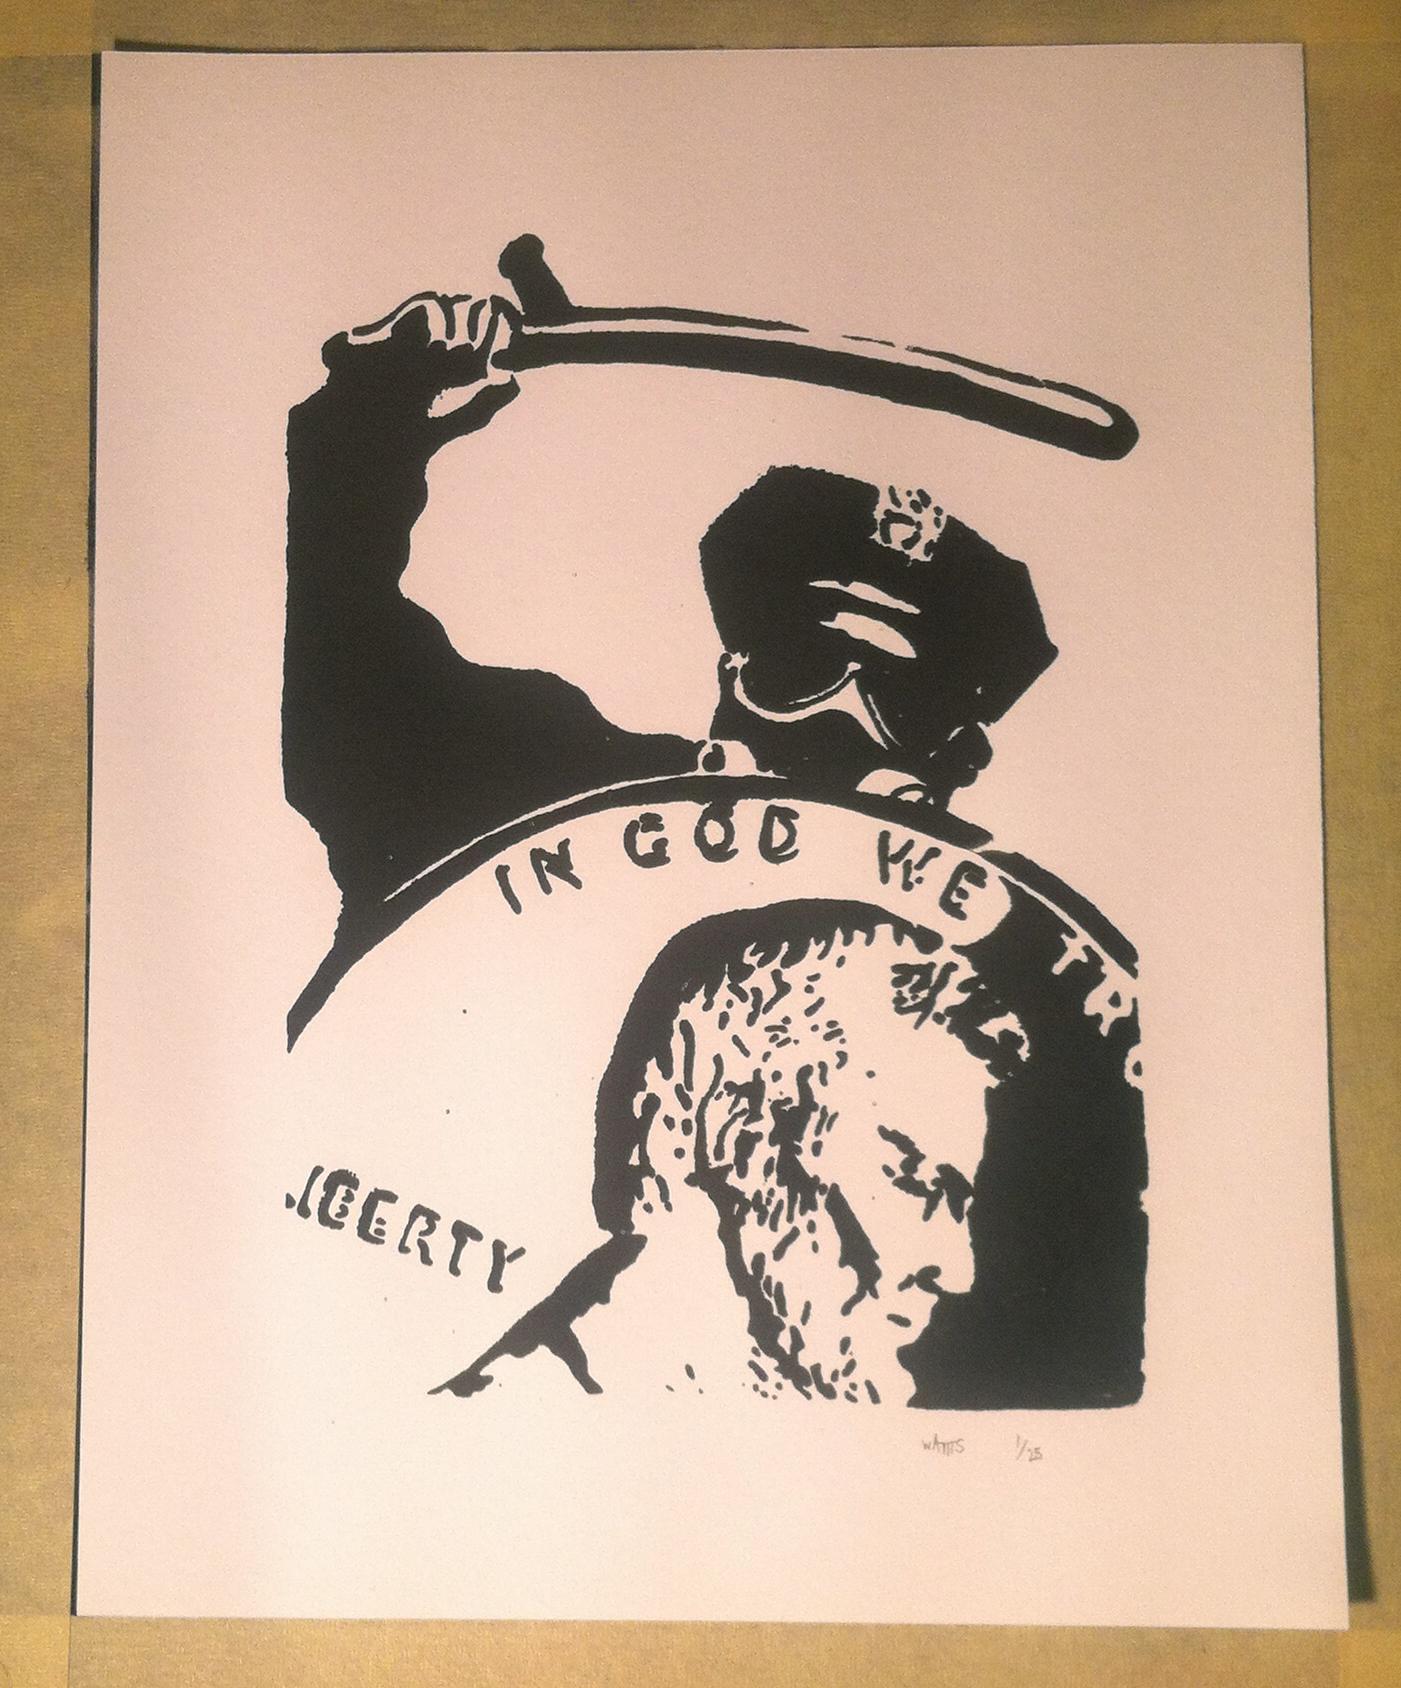 wattts freedom print 1 vf